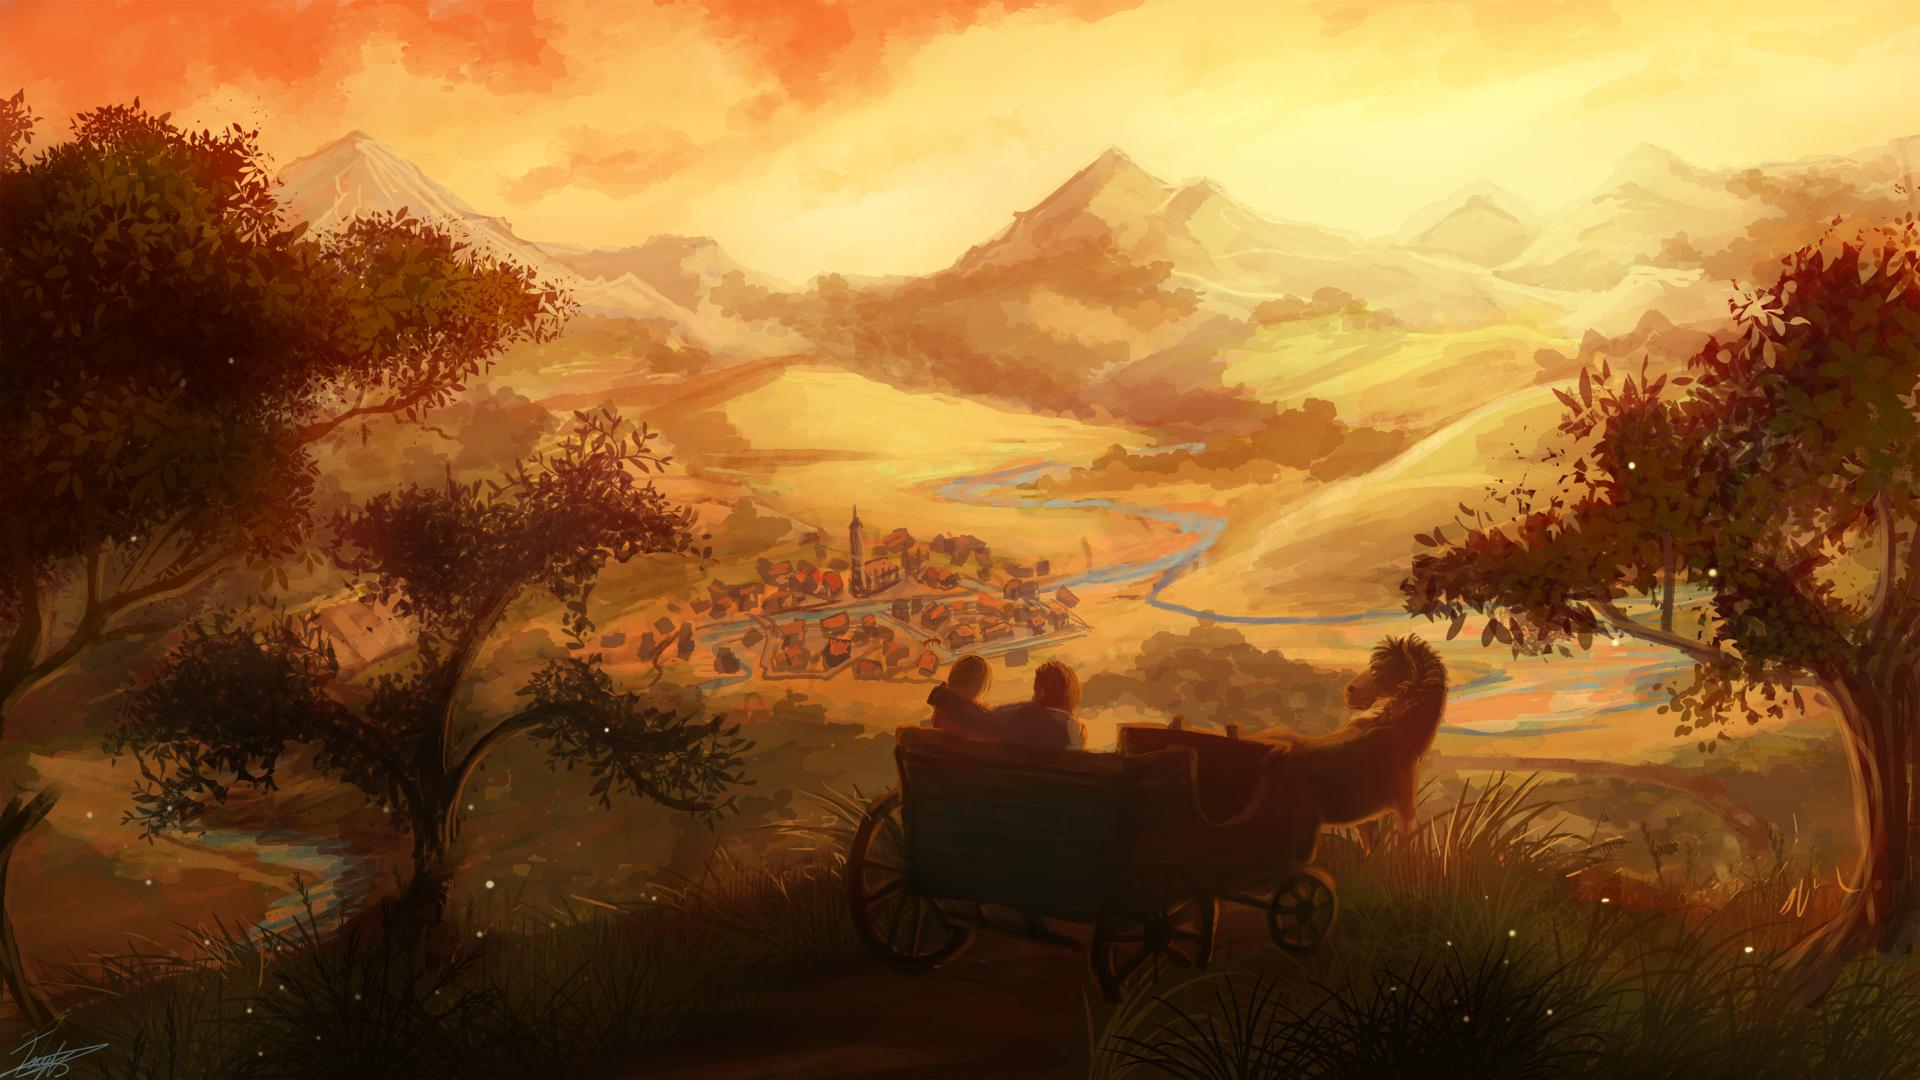 Fantasy Art Wagon , HD Wallpaper & Backgrounds